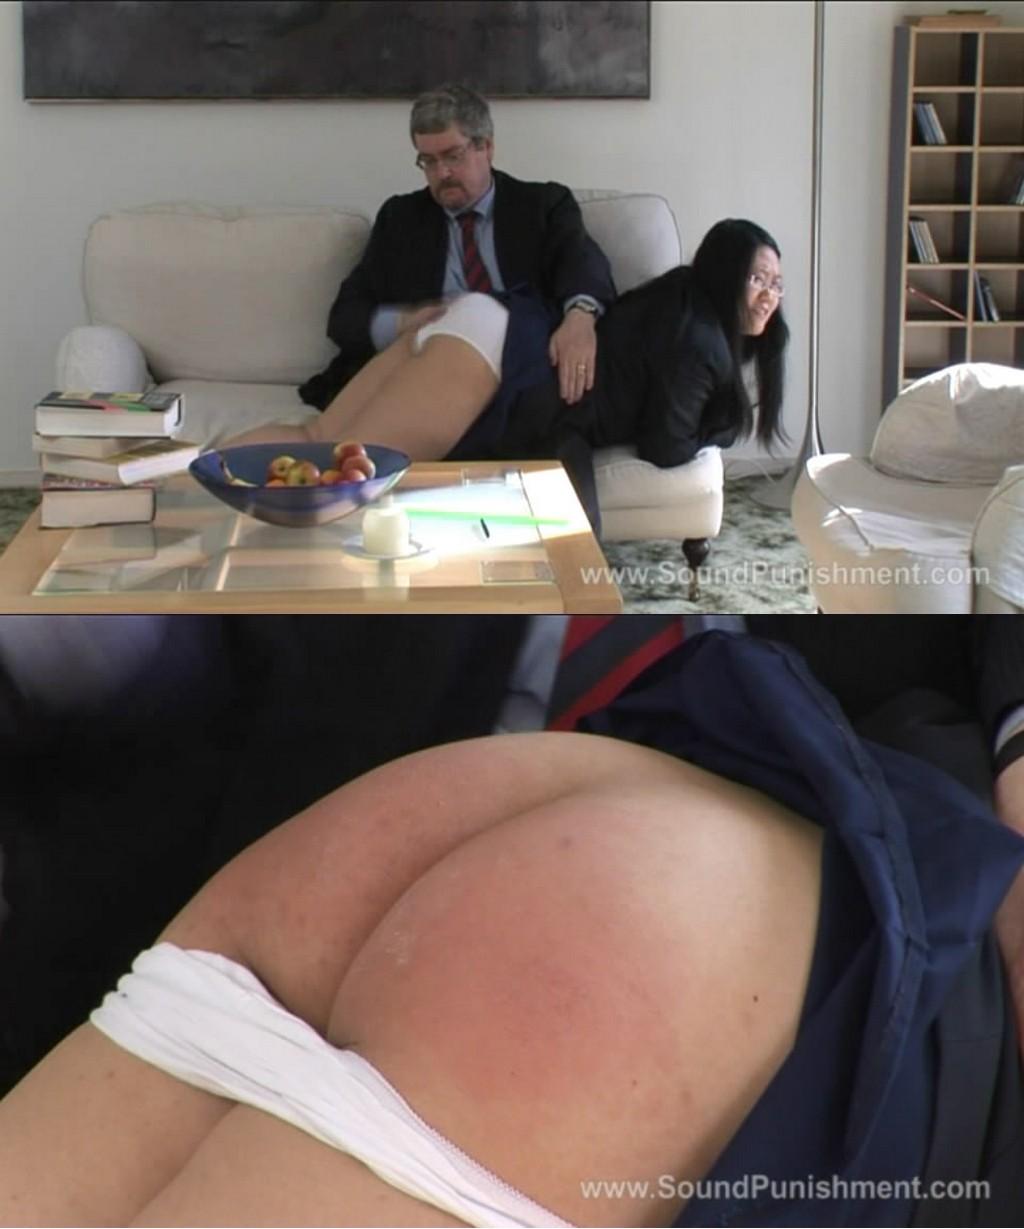 Girls-Spanked-@-Sound-Punishment Only Spanking Video